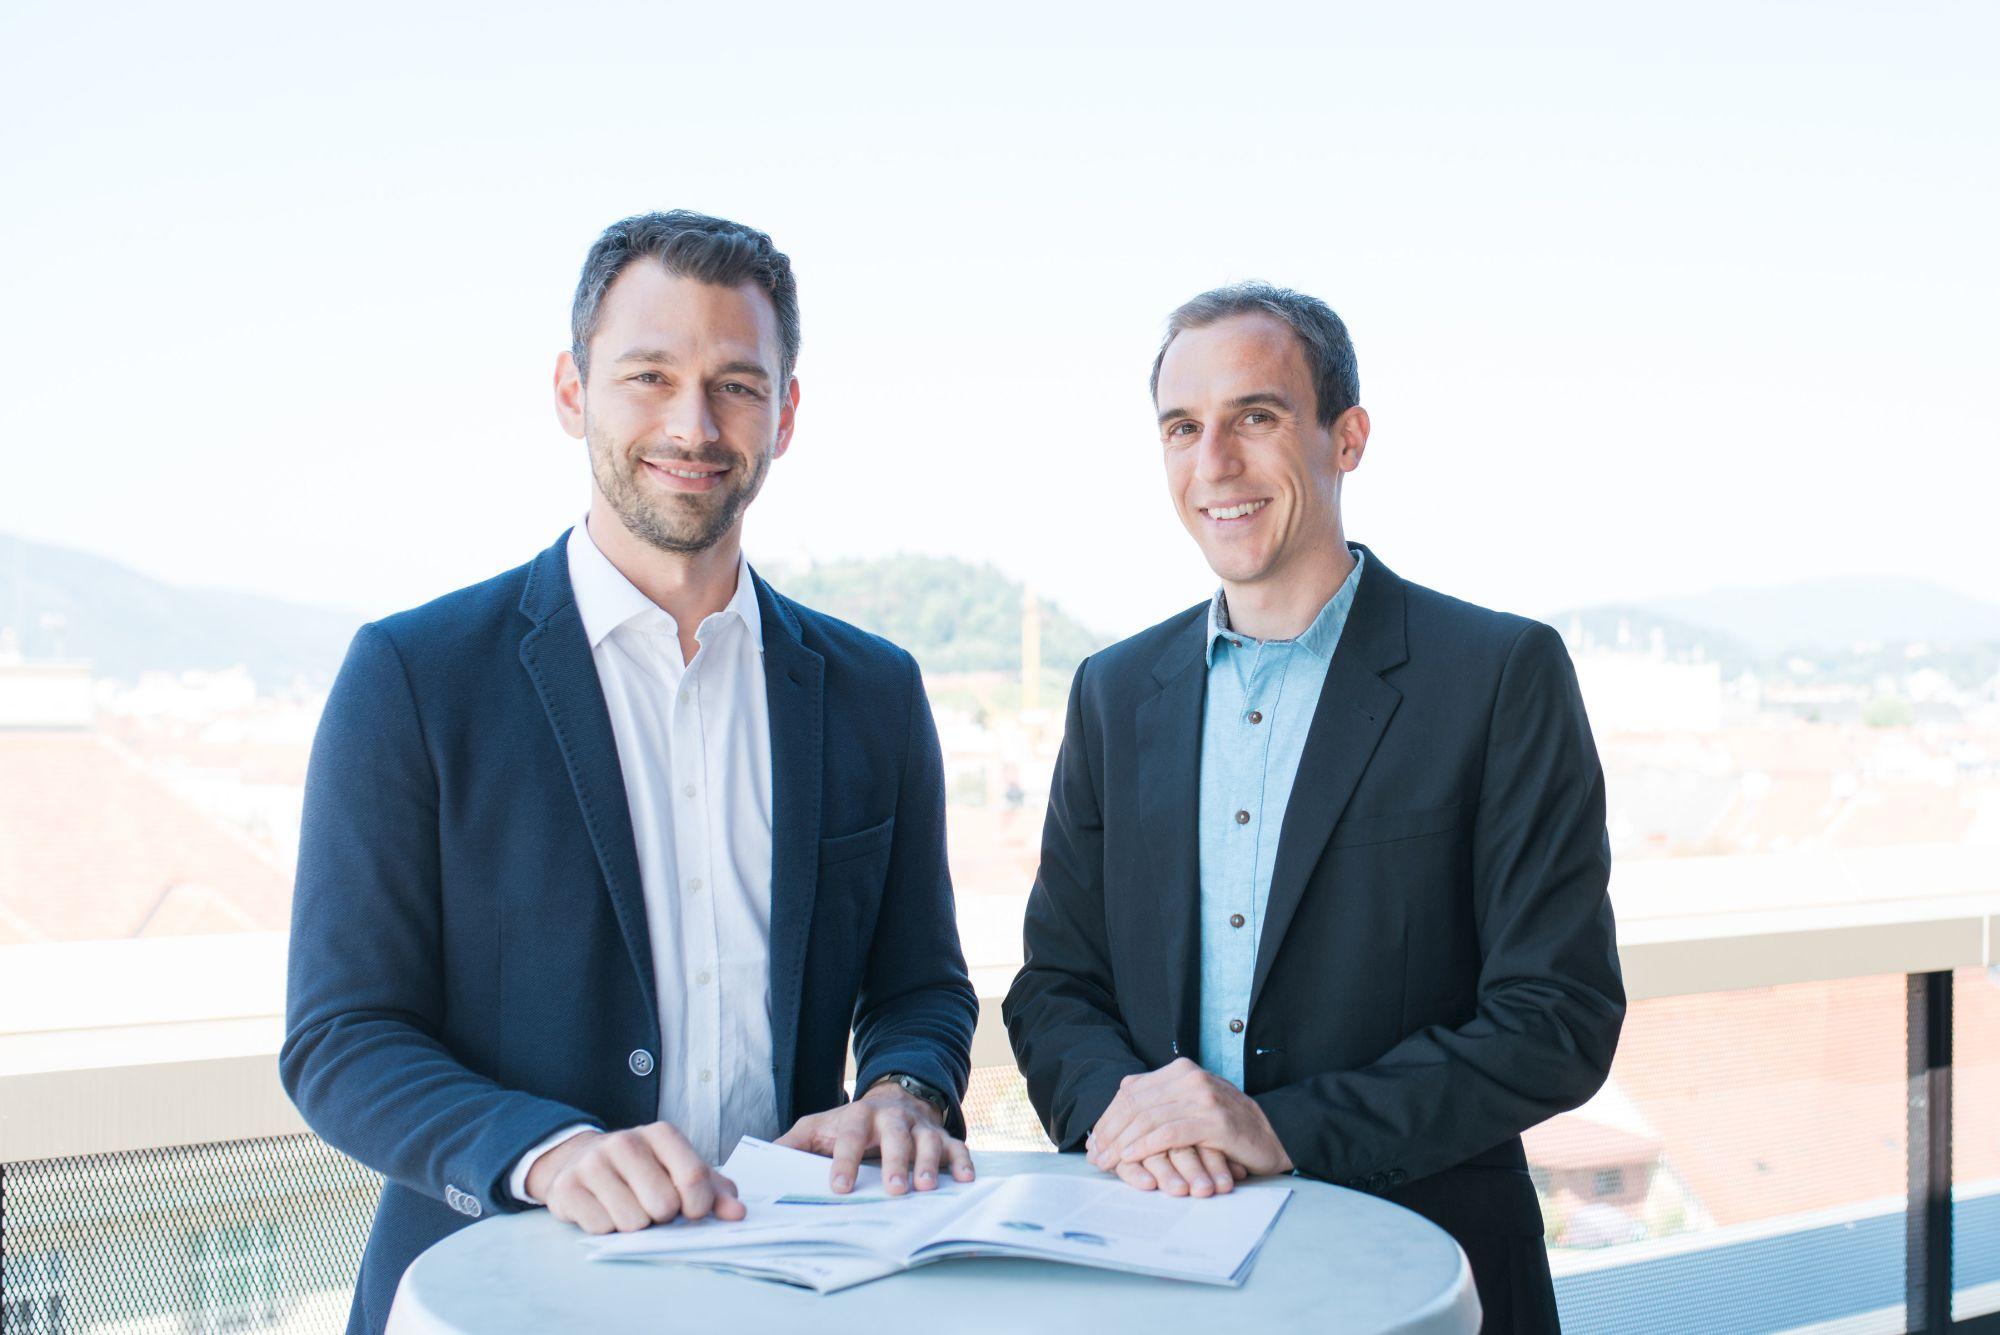 01-kmlvision-founders-2-c-GKartworks